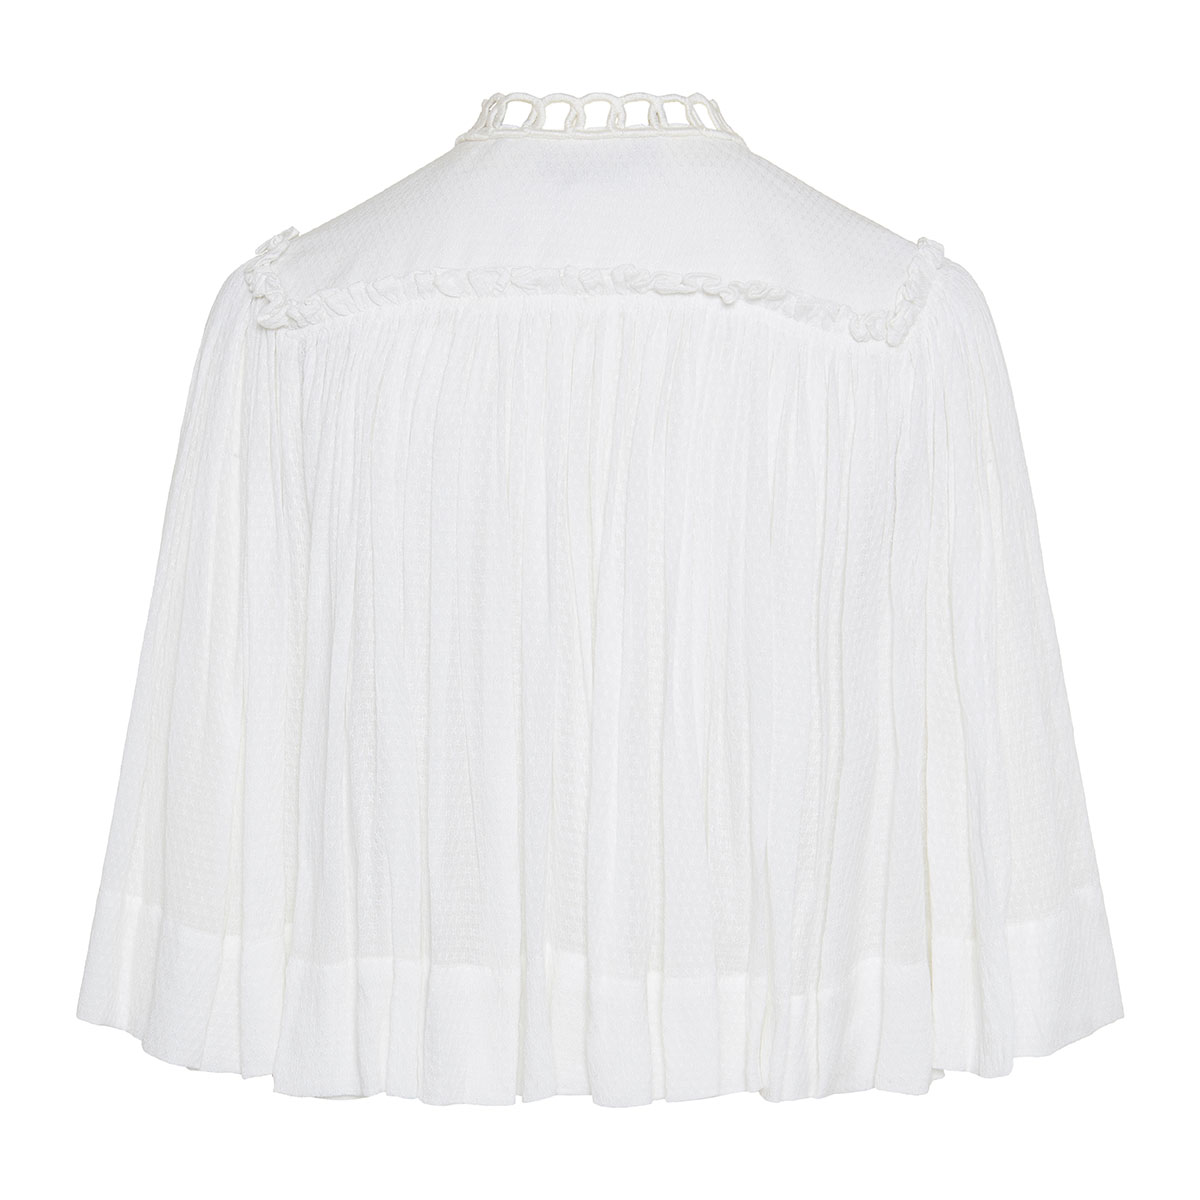 Dahlia gathered blouse